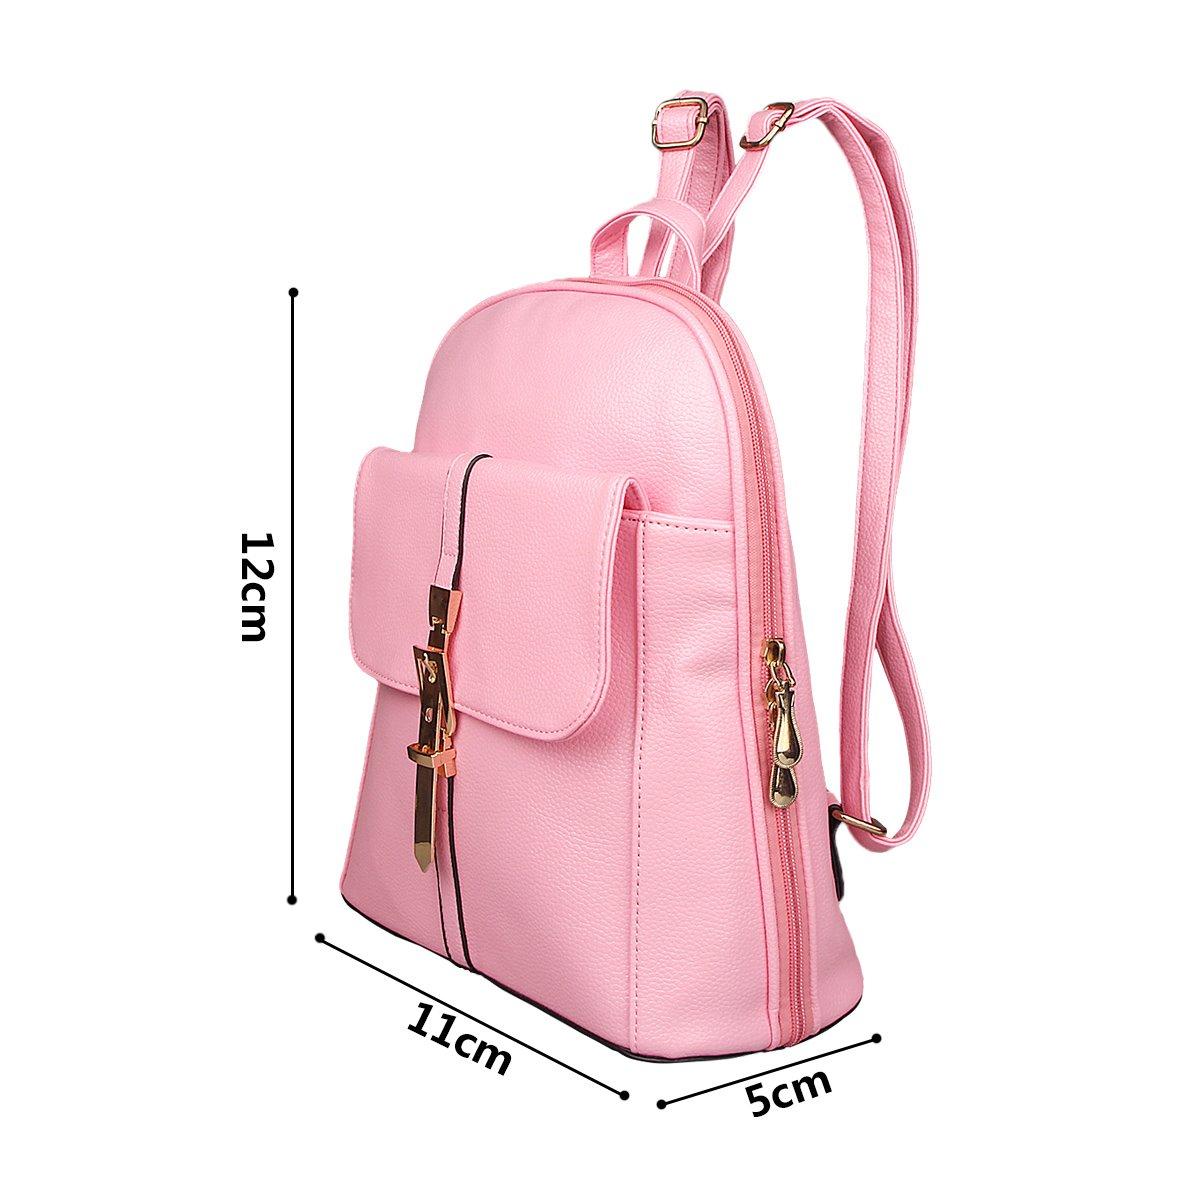 xhorizon TM FL1 Leather Mini School Bag Travel Backpack Rucksack Shoulder Bag Satchel (Navy) by xhorizon (Image #4)